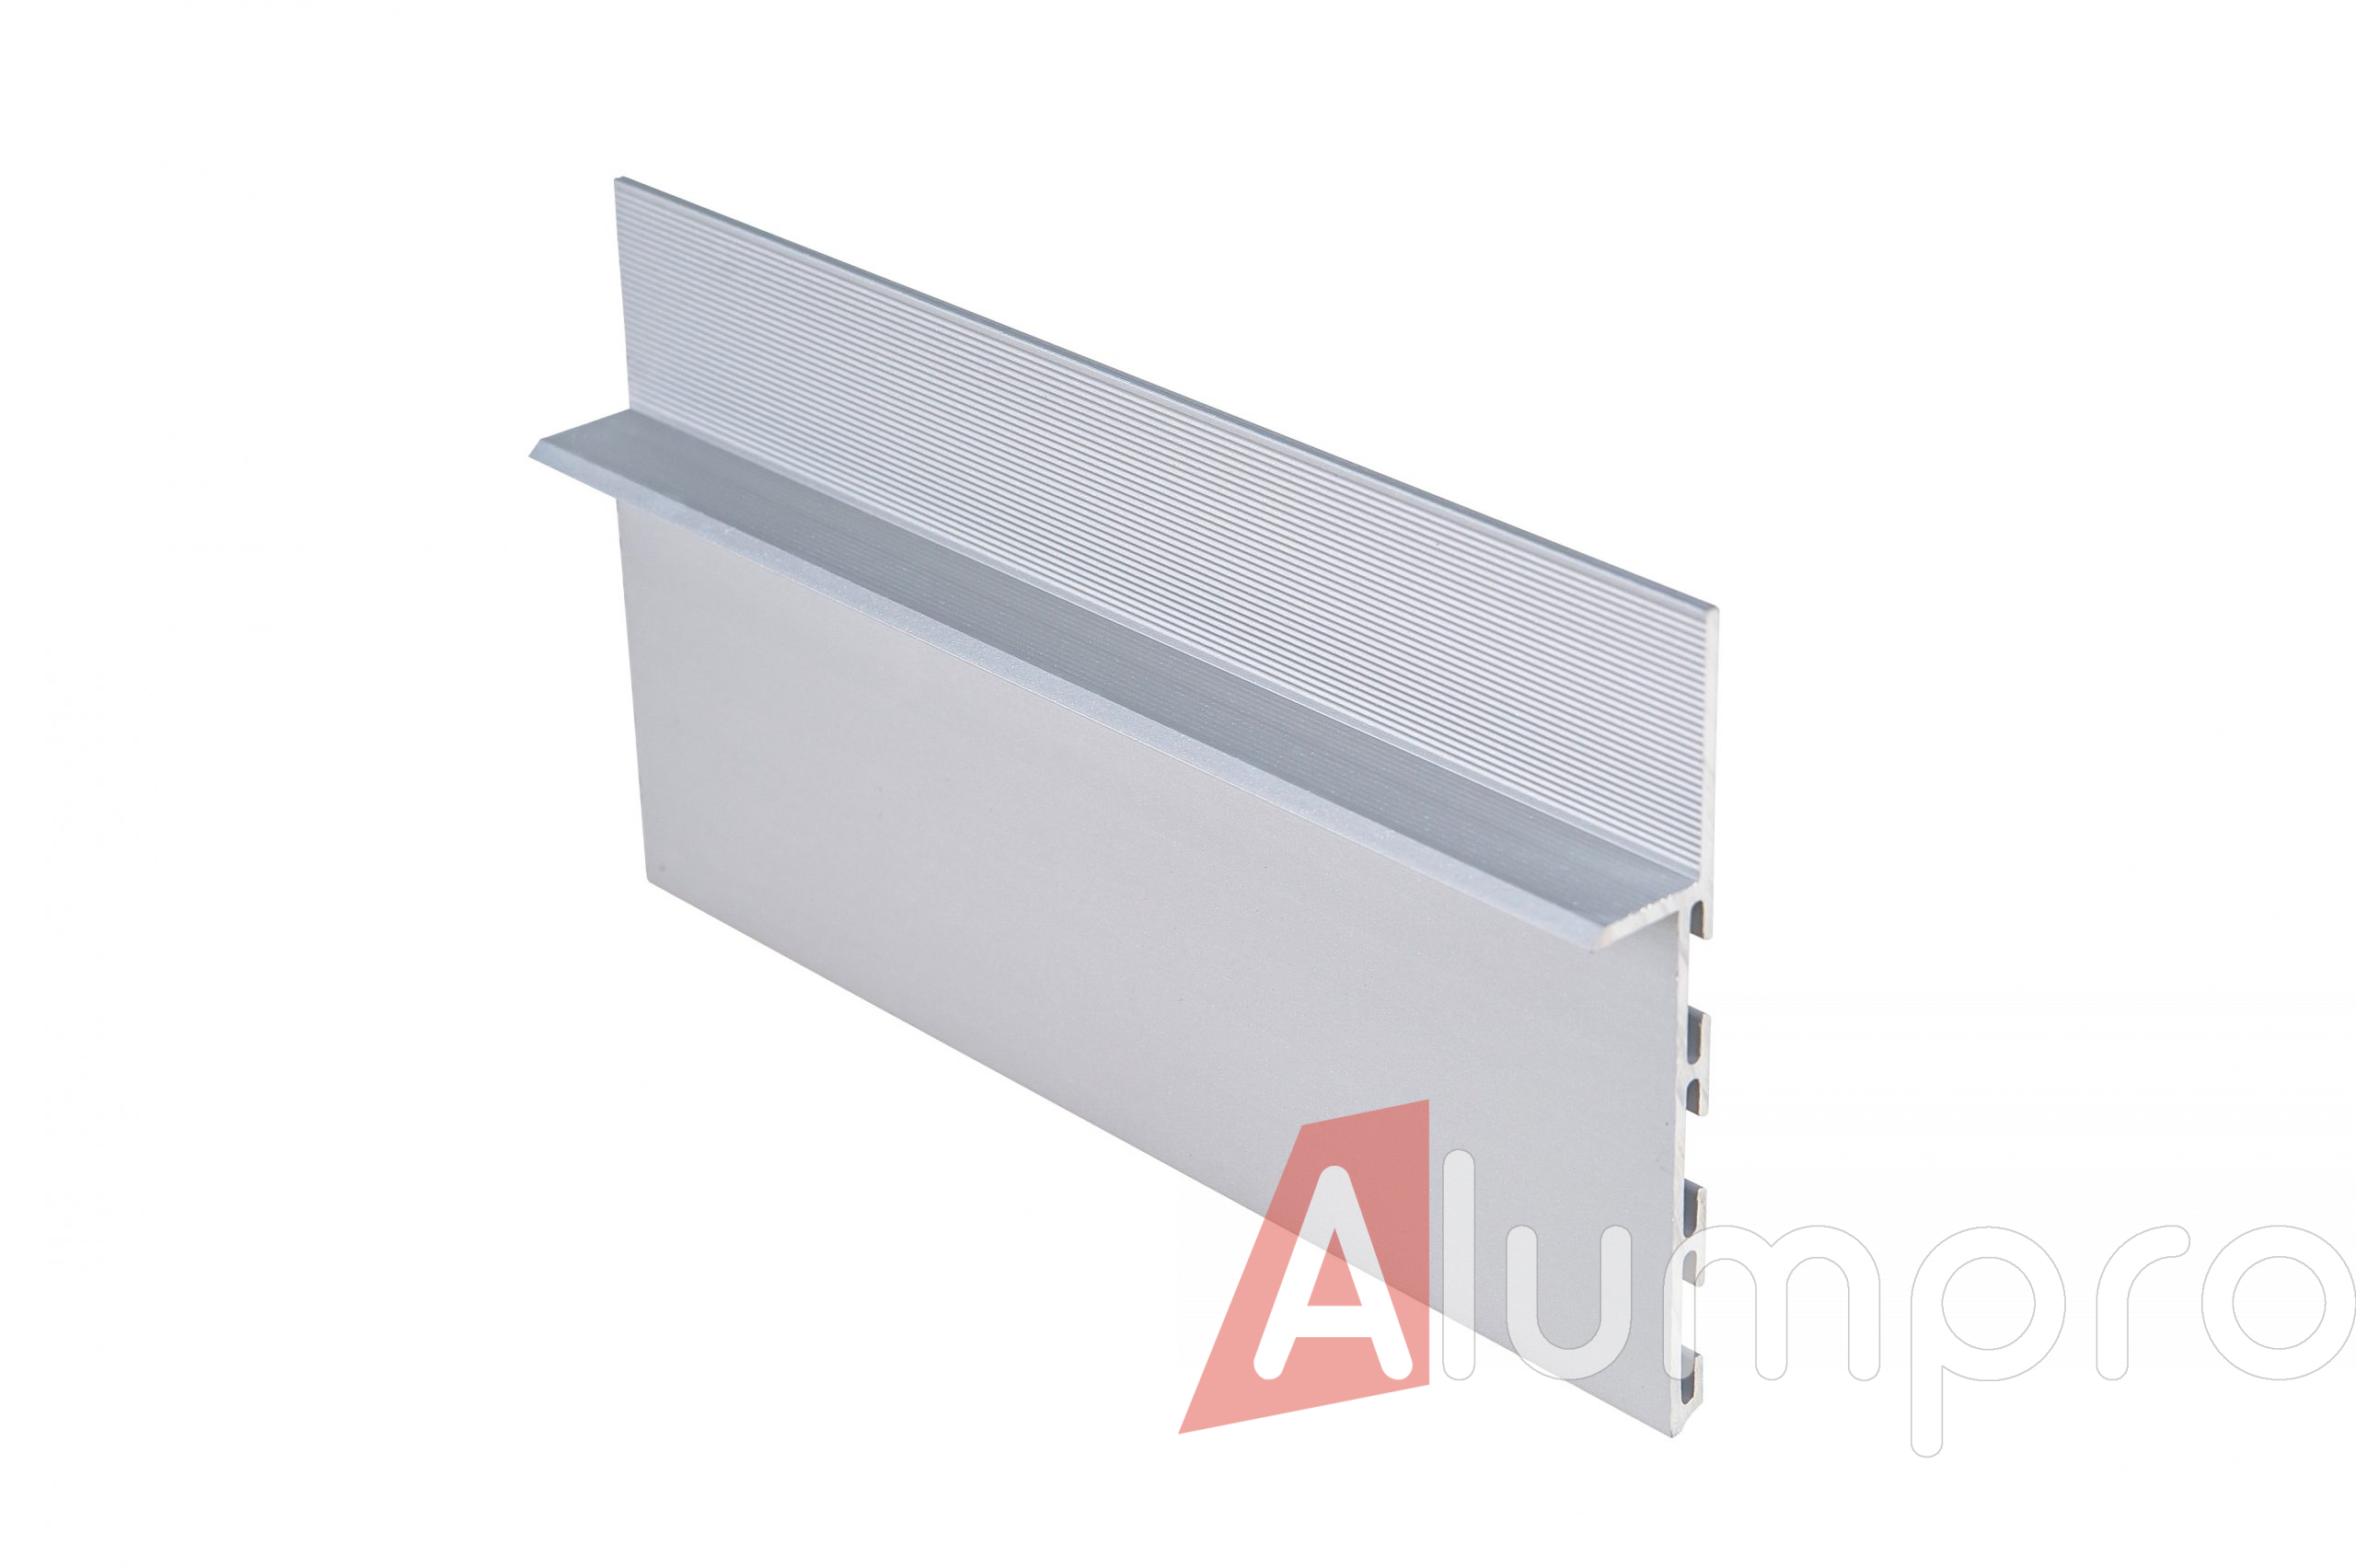 Скрытый плинтус 80 мм (без покрытия)